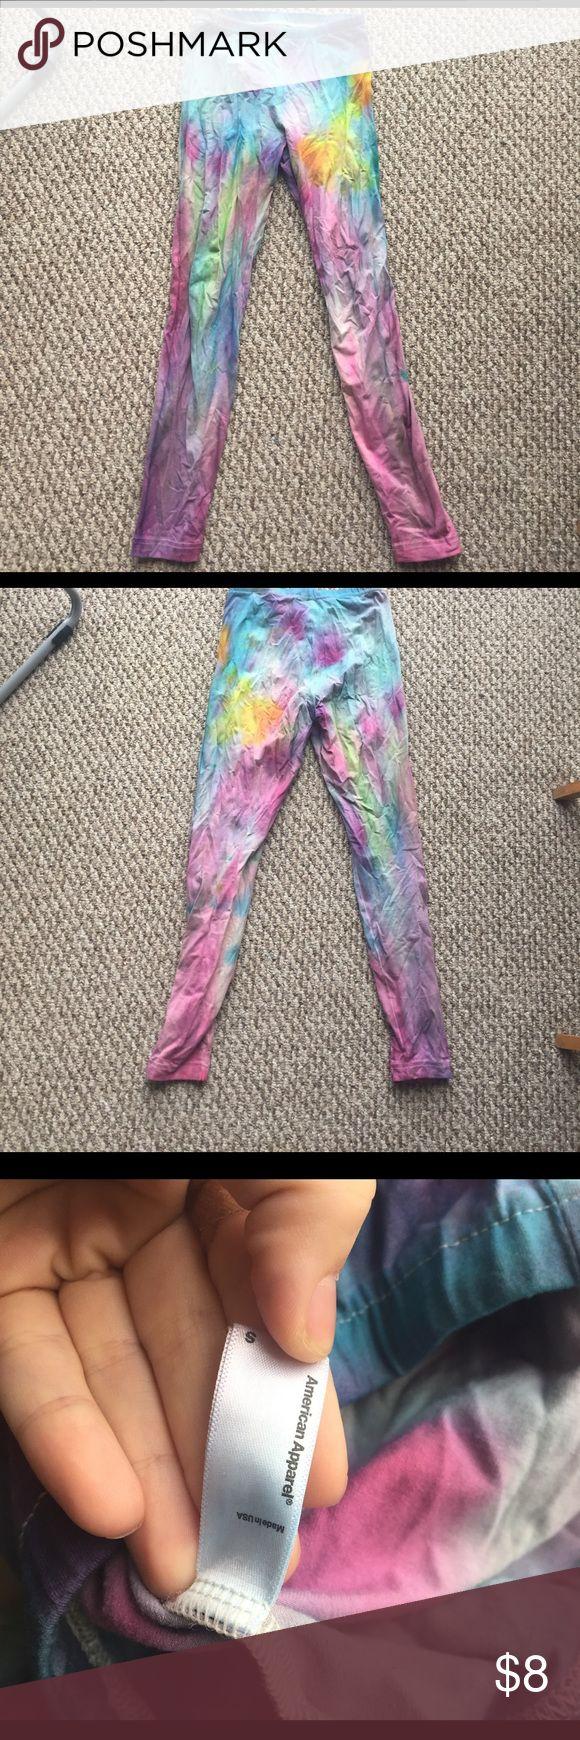 American Apparel tye dye leggings AA tye dye leggings American Apparel Pants Leggings